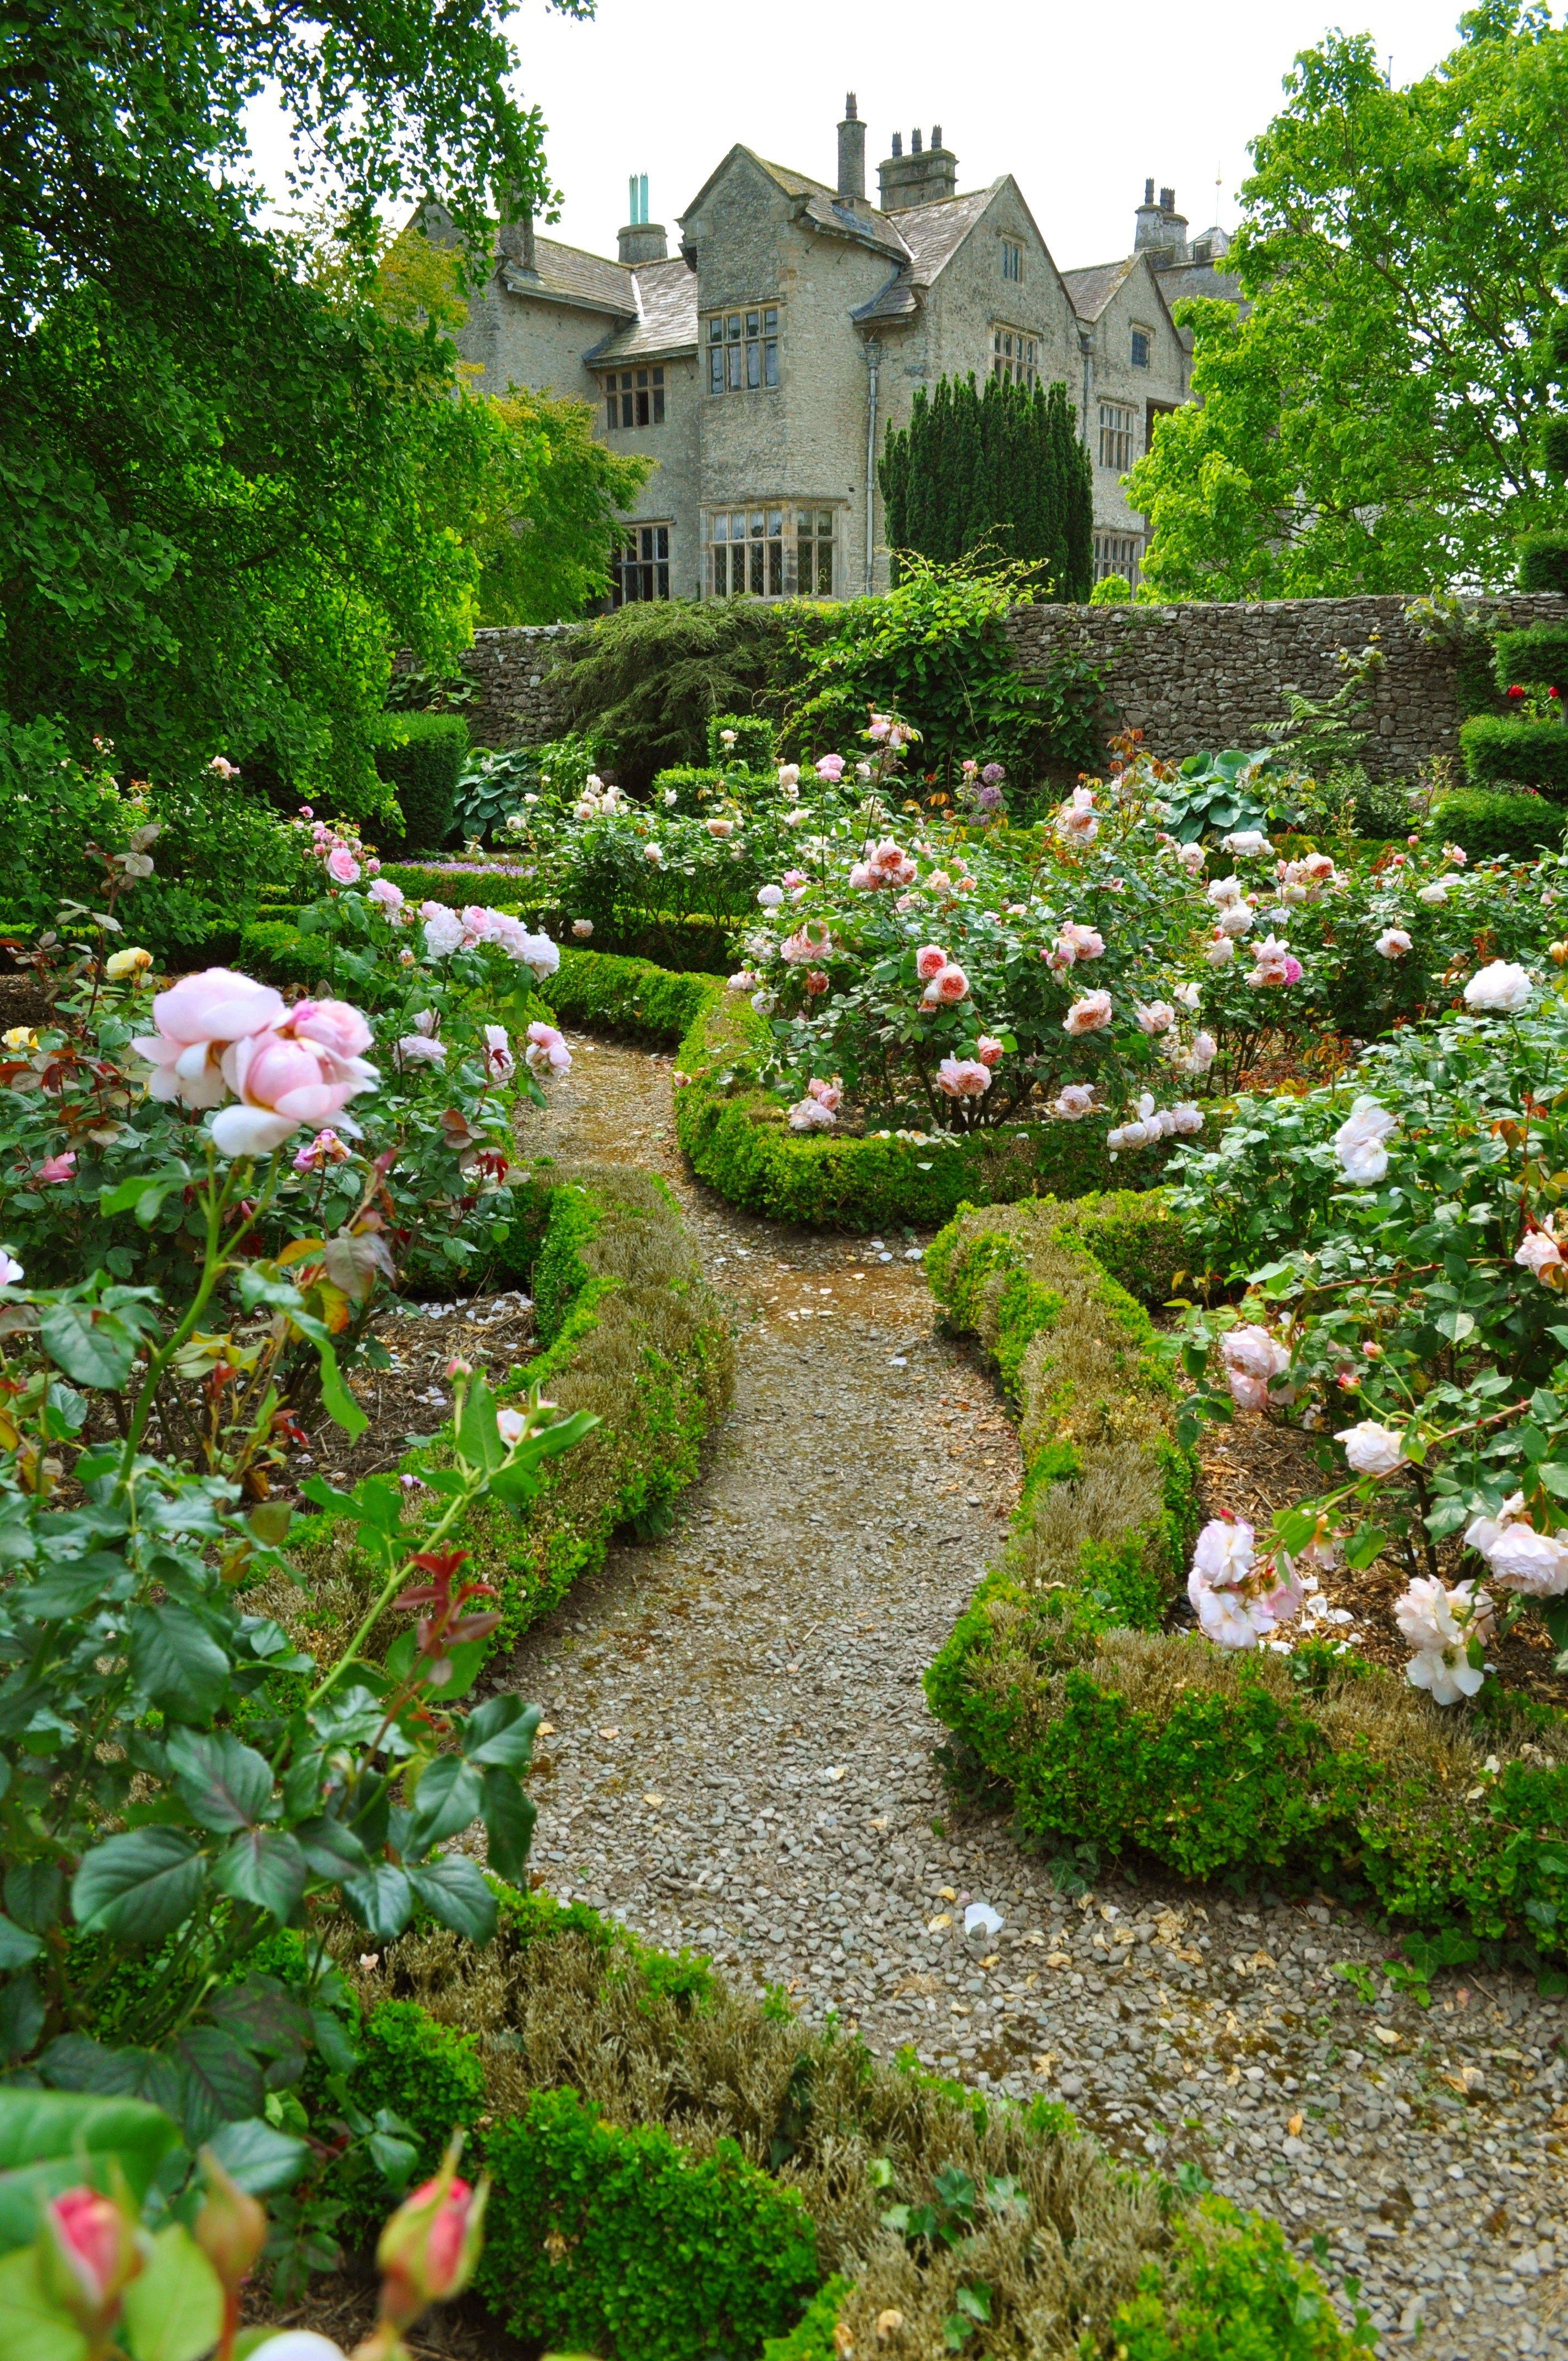 70817dbcb399083de80c90beacb1c987 - Historic House And Gardens Near Me